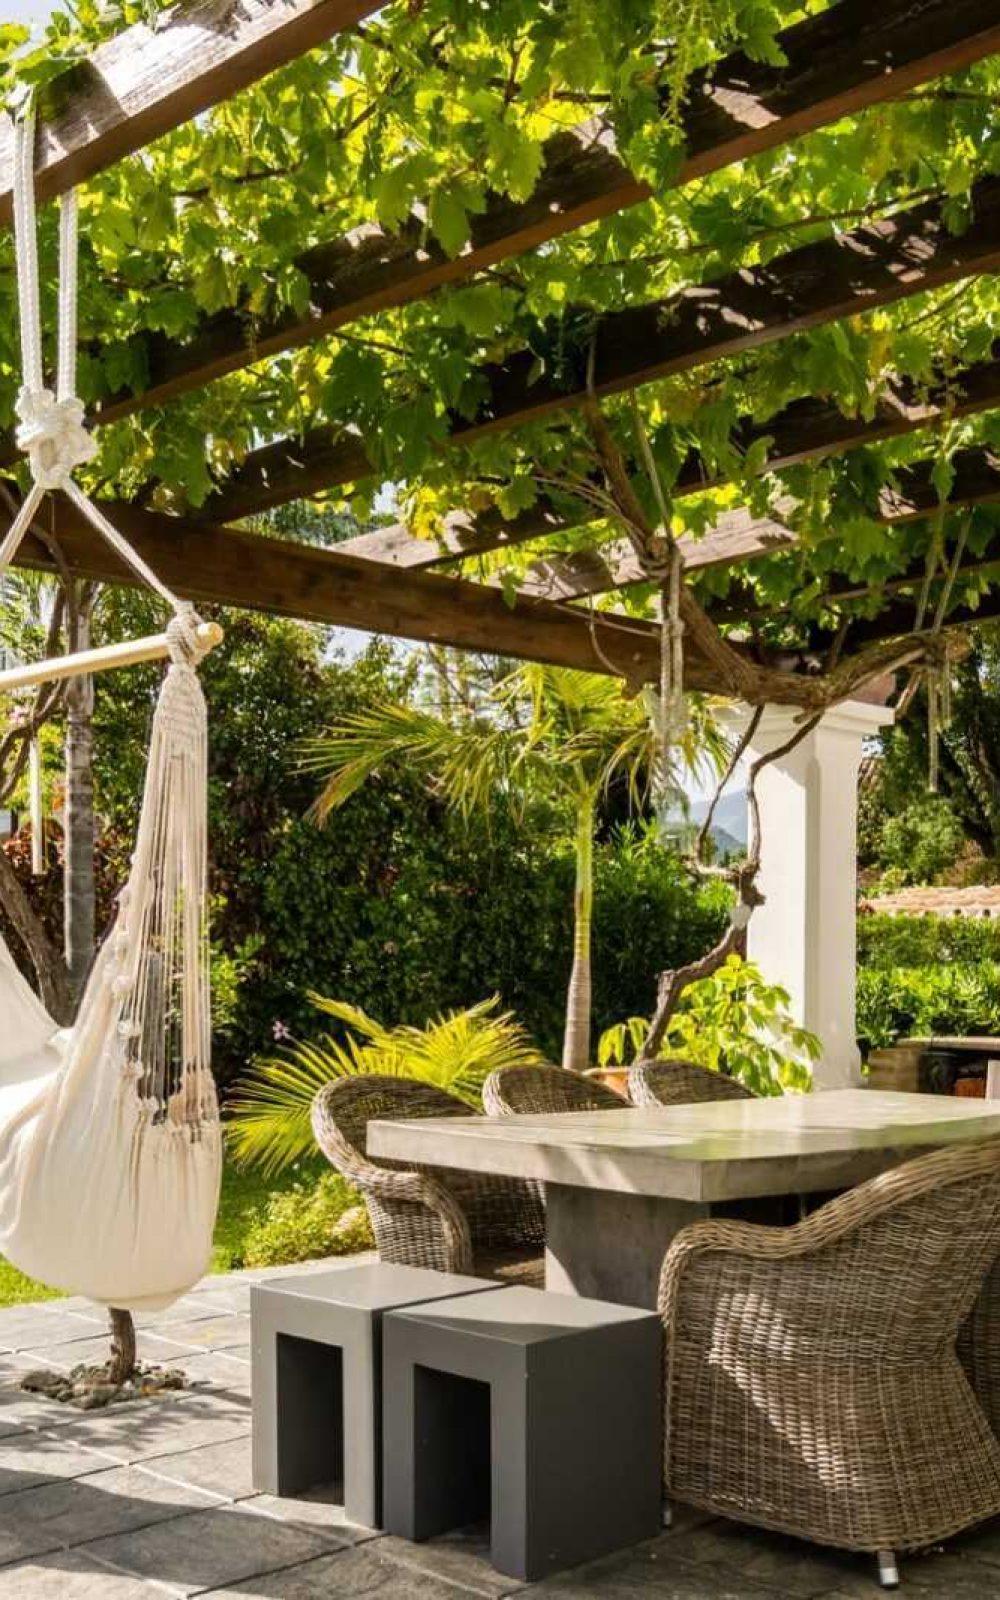 2017.06.01 - Just Rent Marbella - Villa Marlin - (6 of 6) (Large)